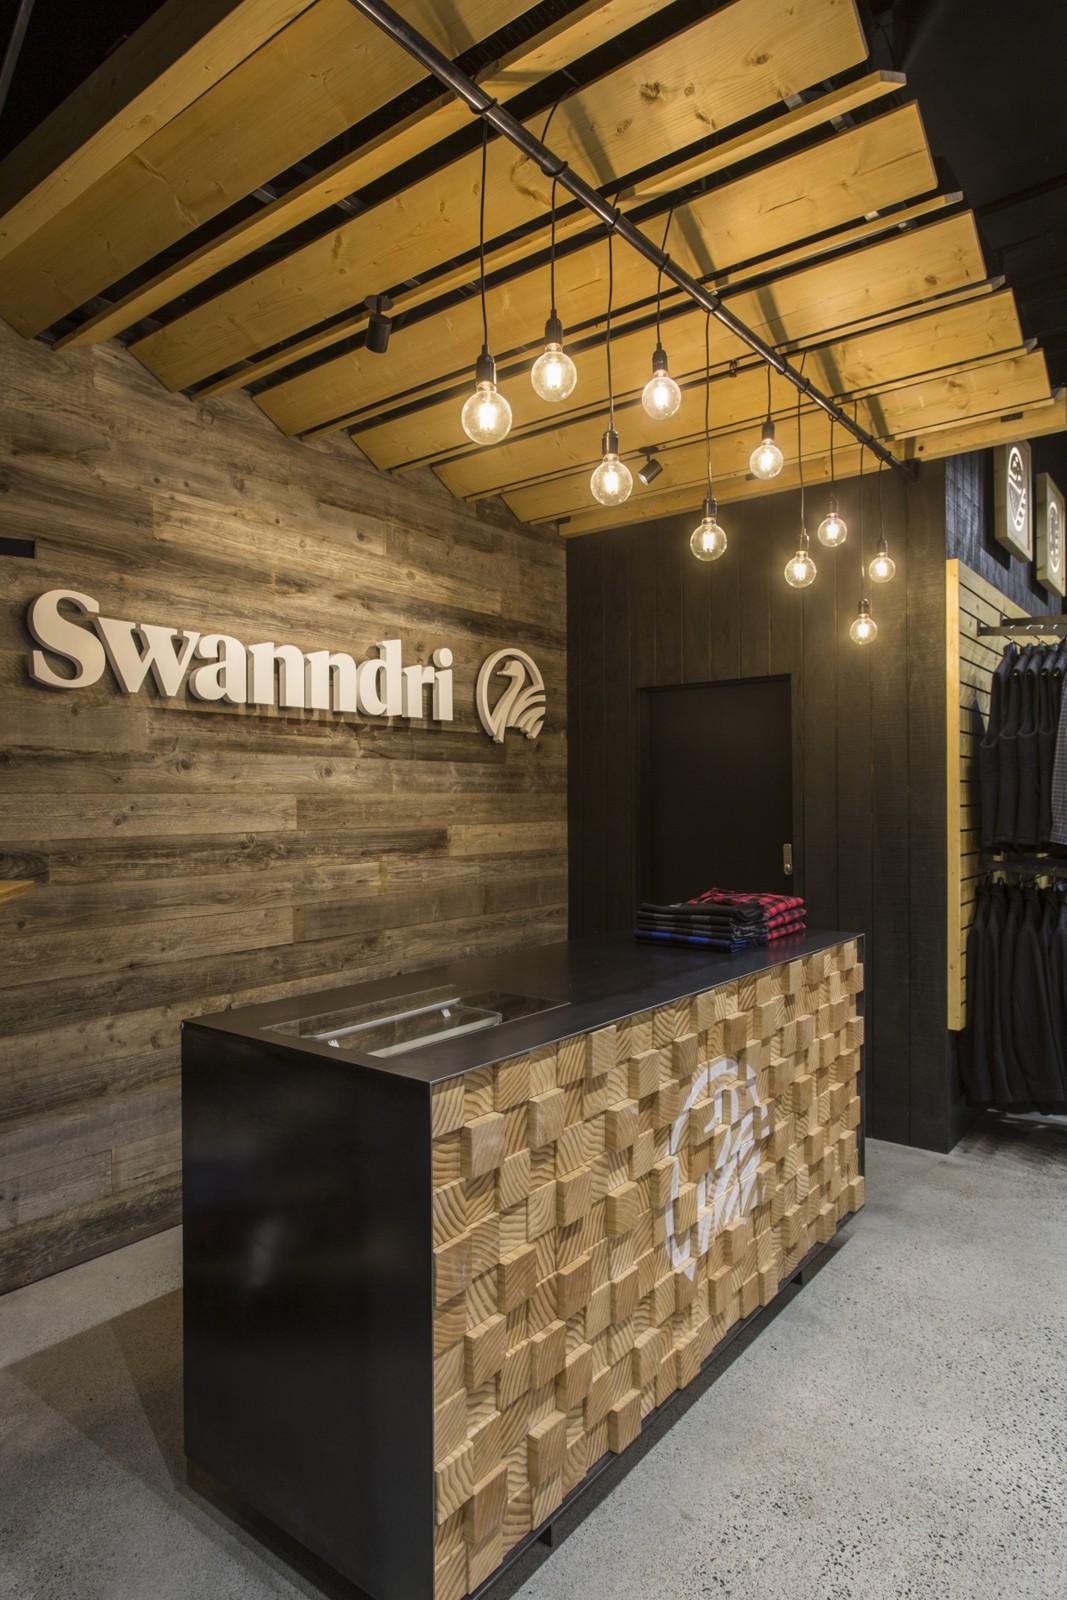 Swanndri-05.jpg